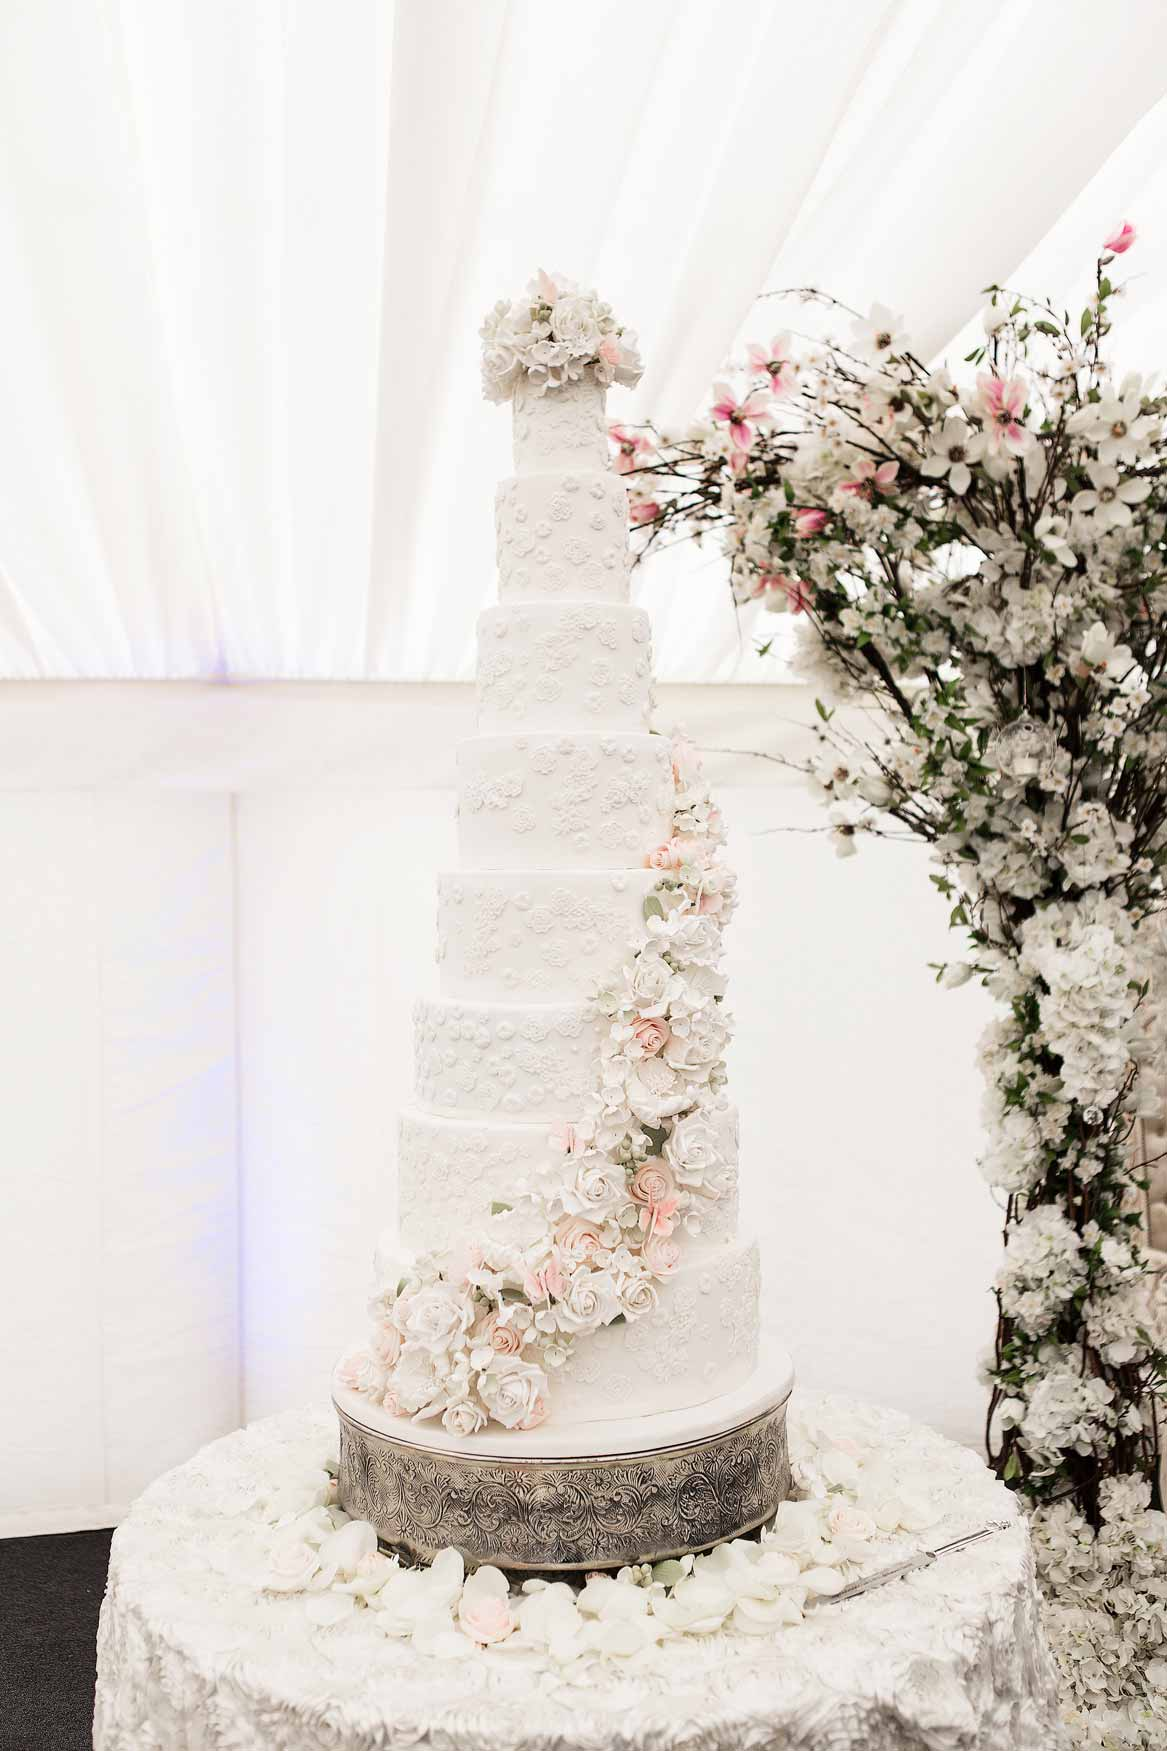 8 Tier Wedding Cake Design - 5000+ Simple Wedding Cakes